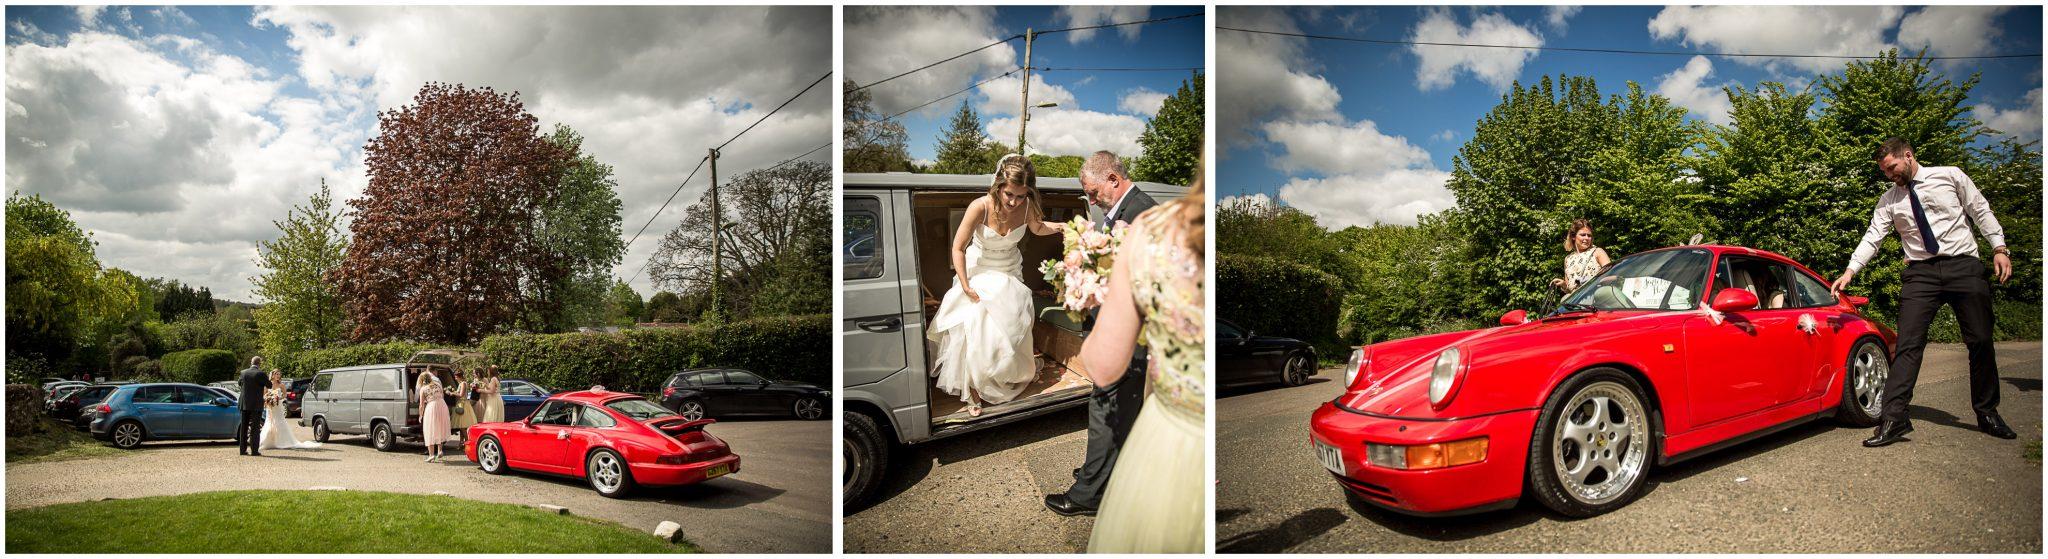 Bride and bridesmaids arrive at Twyford Church in wedding vehicles Porsche 911